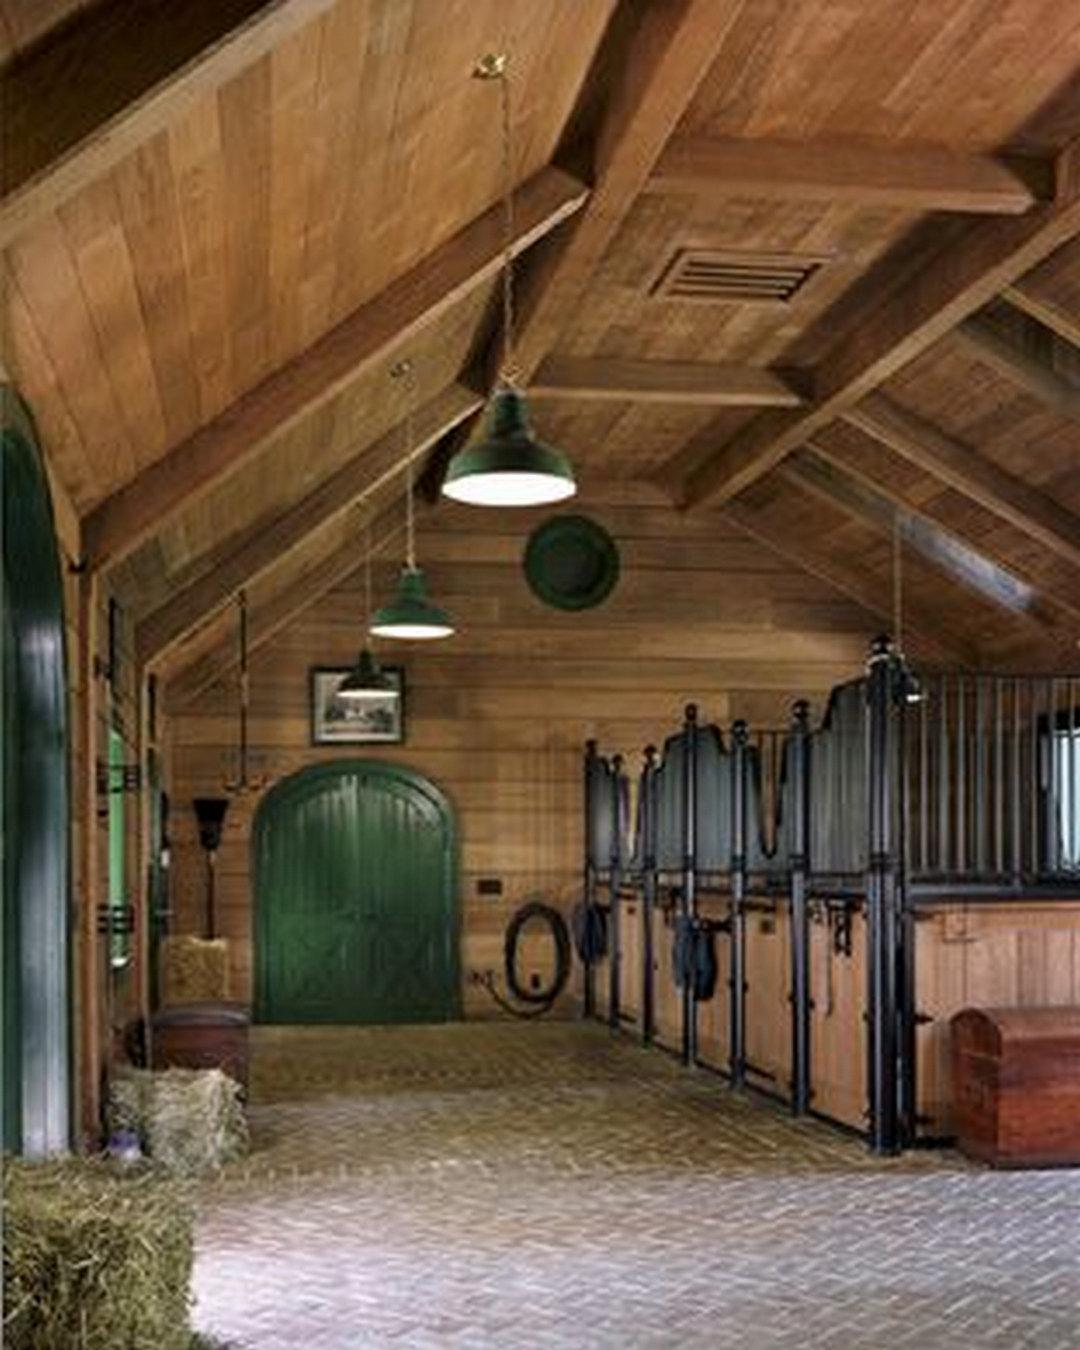 17 Stunning Interior Design Ideas for Living Room | Dream ...